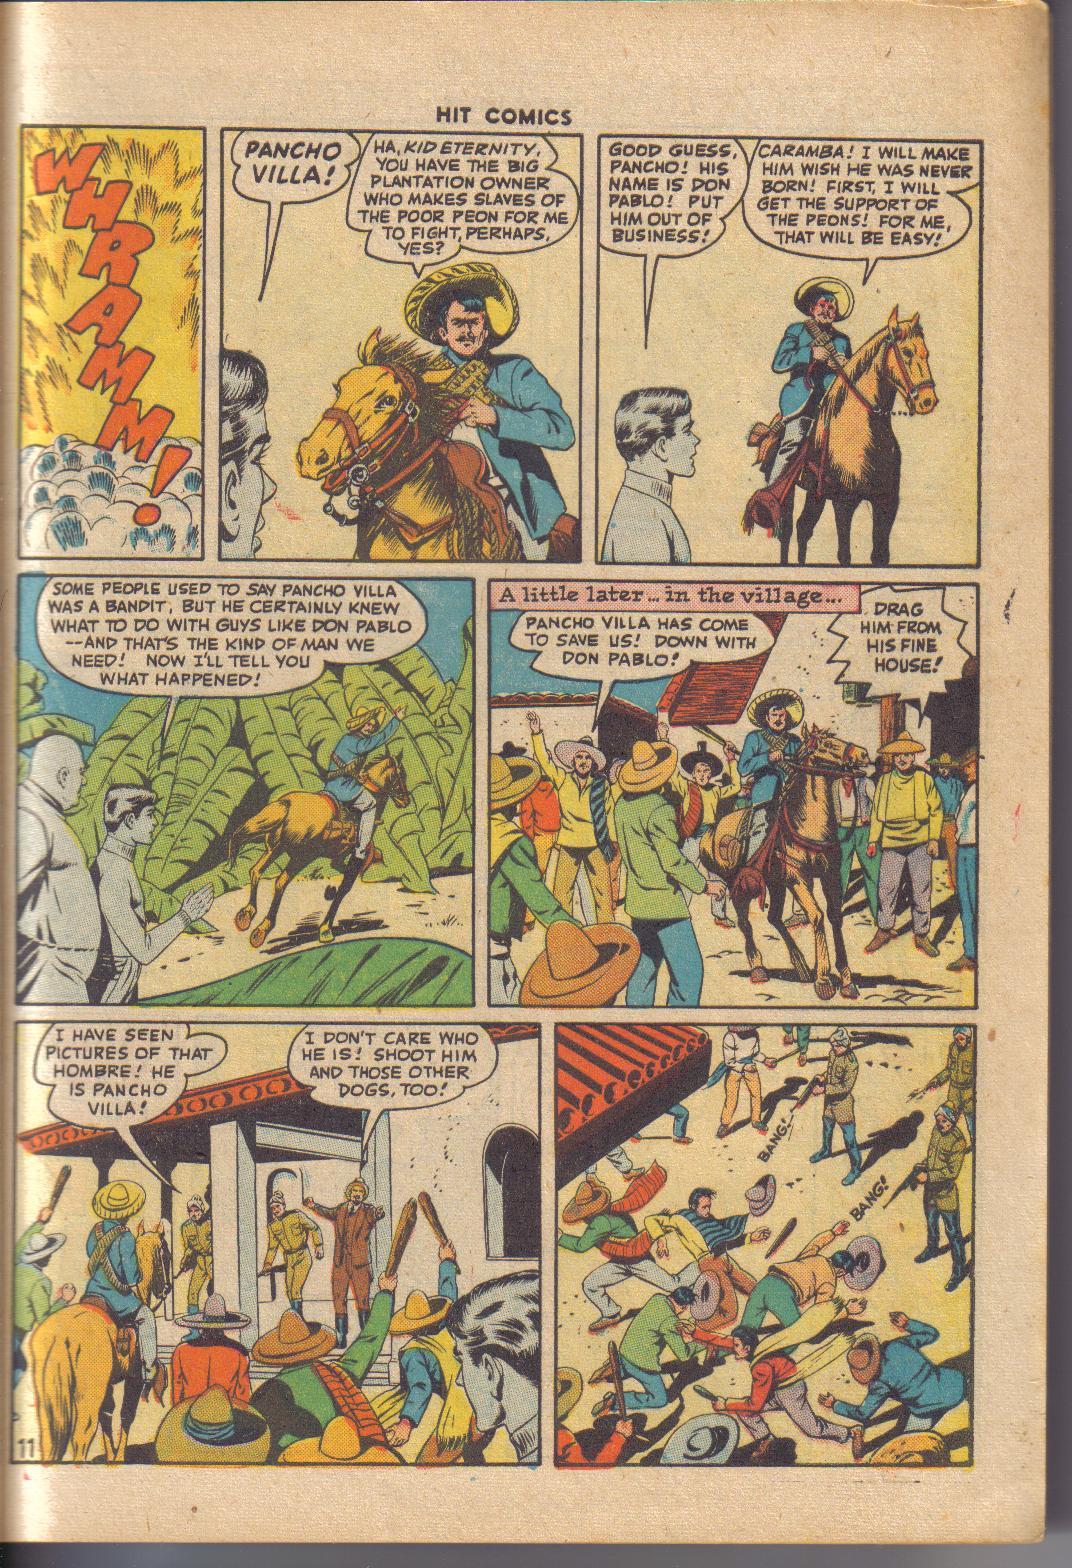 Read online Hit Comics comic -  Issue #45 - 13